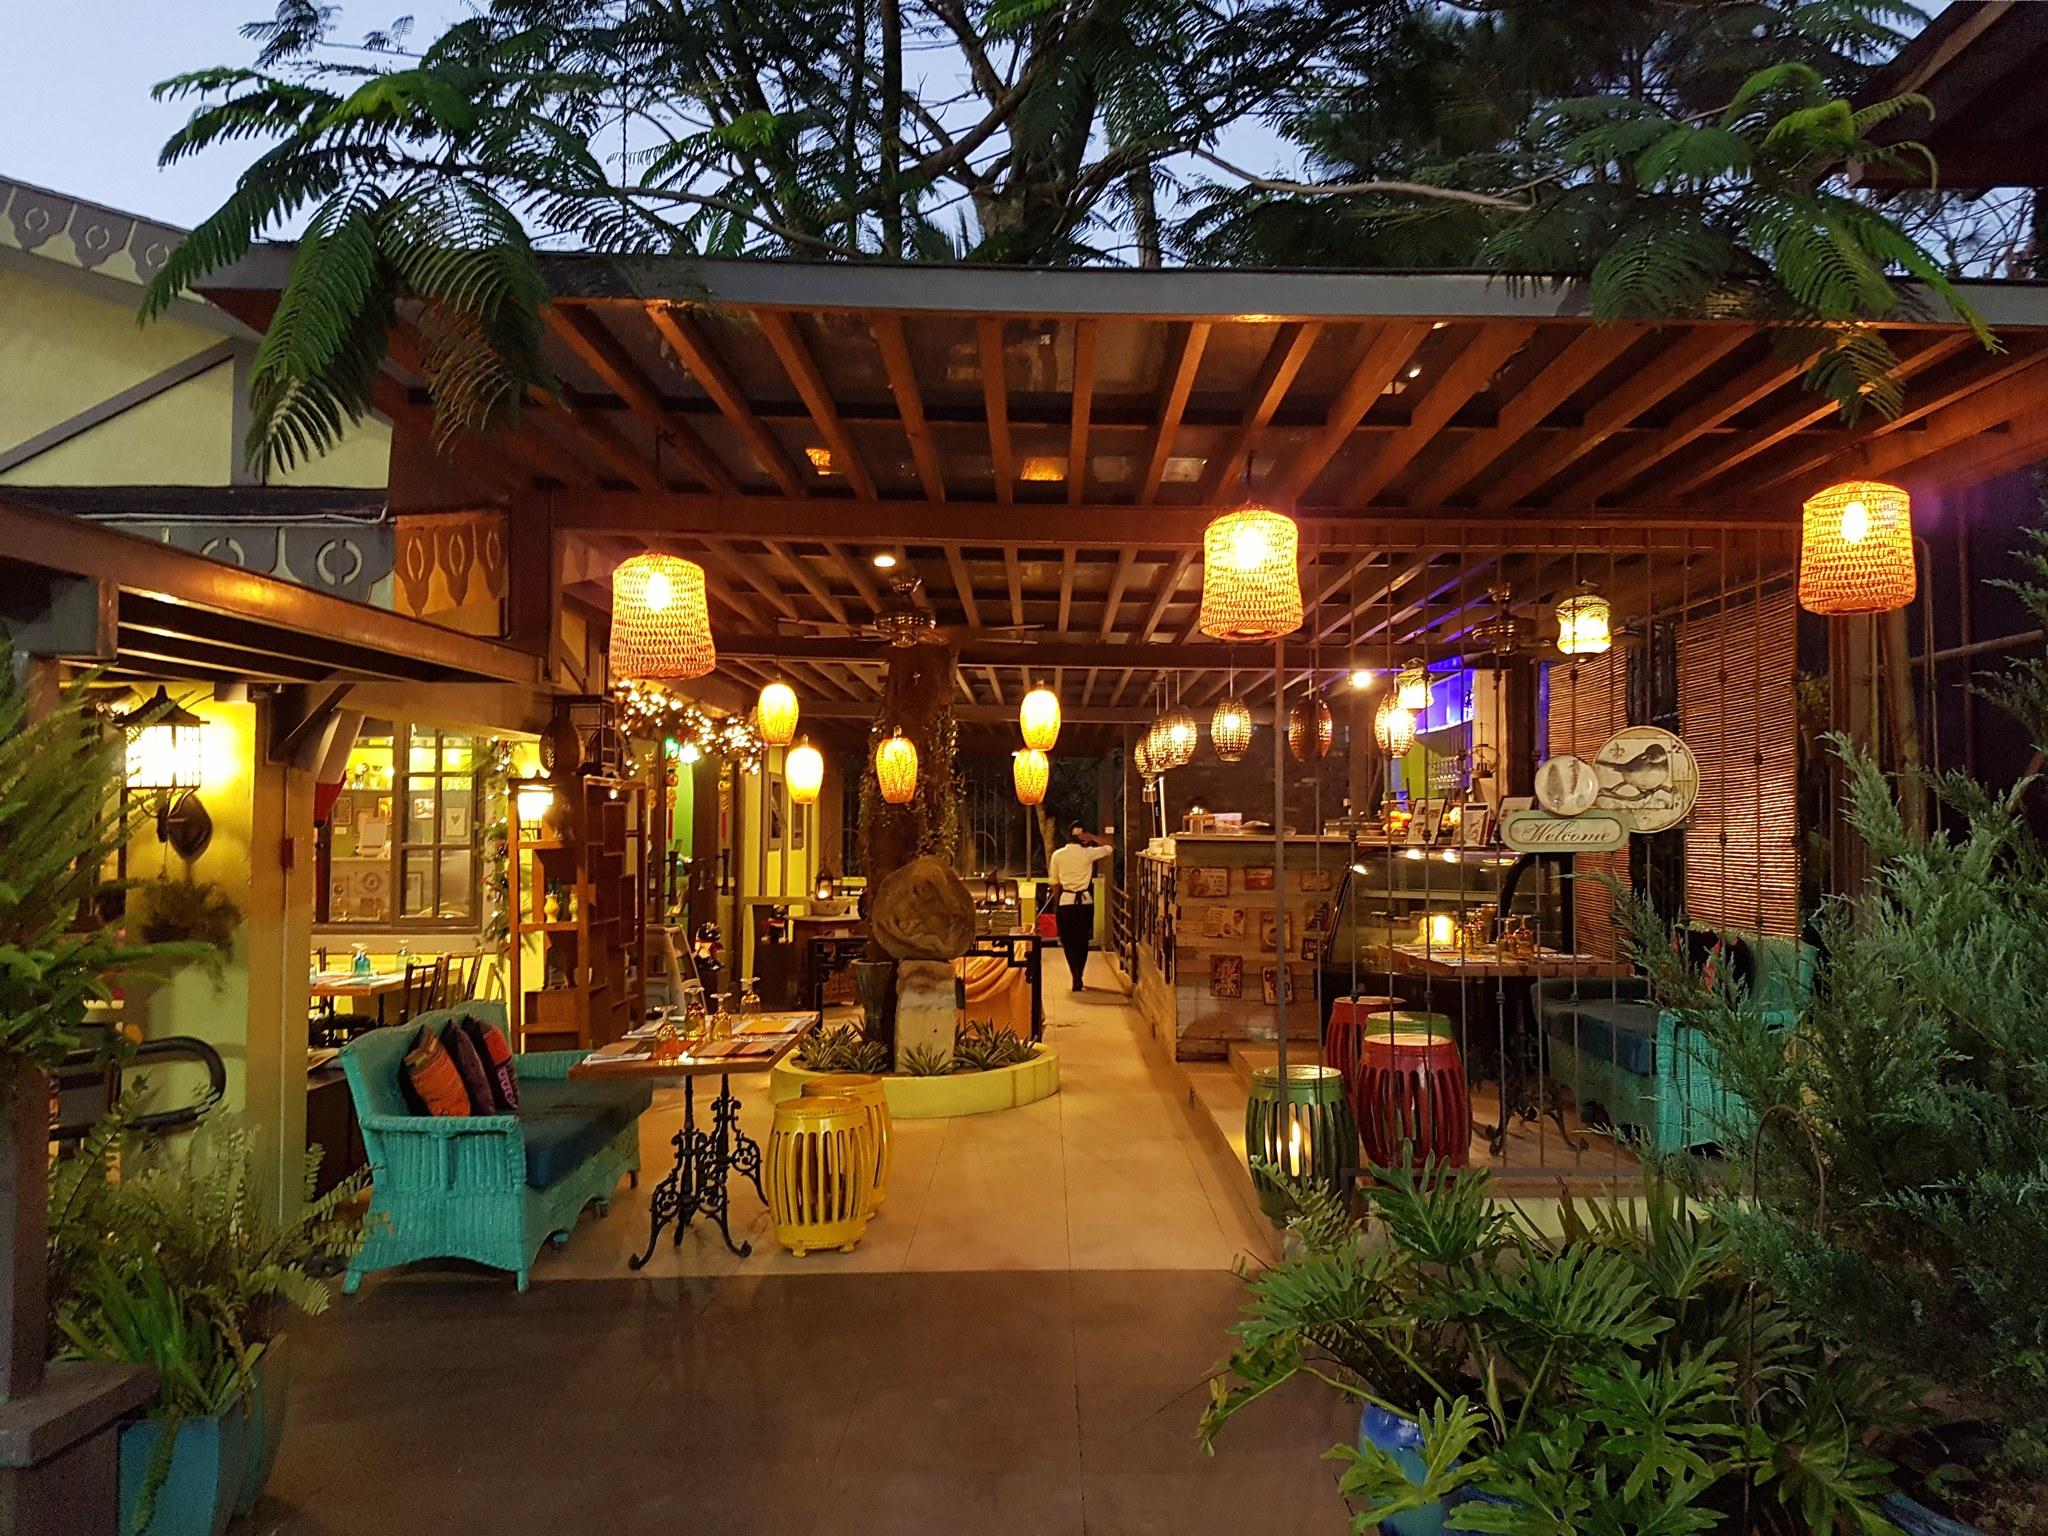 rustic breakfast spots in tagaytay cafe voila